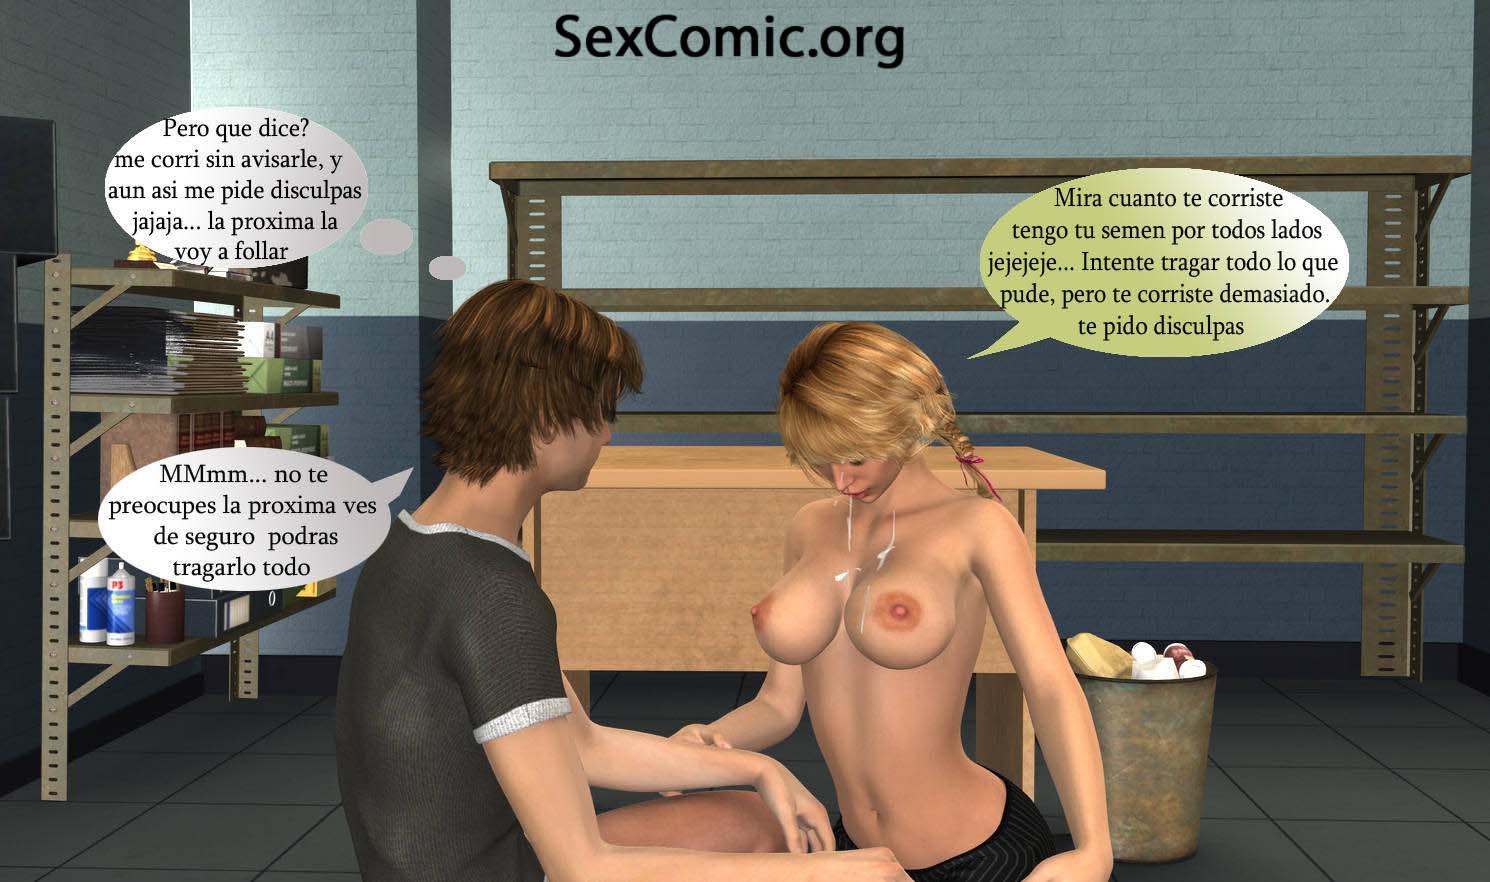 comic-xxx-3d-seduciendo-alas-empleadas-de-mama-historias-sexuales-mangas-para-adultos-videos-deincesto-comics-xxx-historias-eroticas-fantacias-sexuales-gtaris-online-56